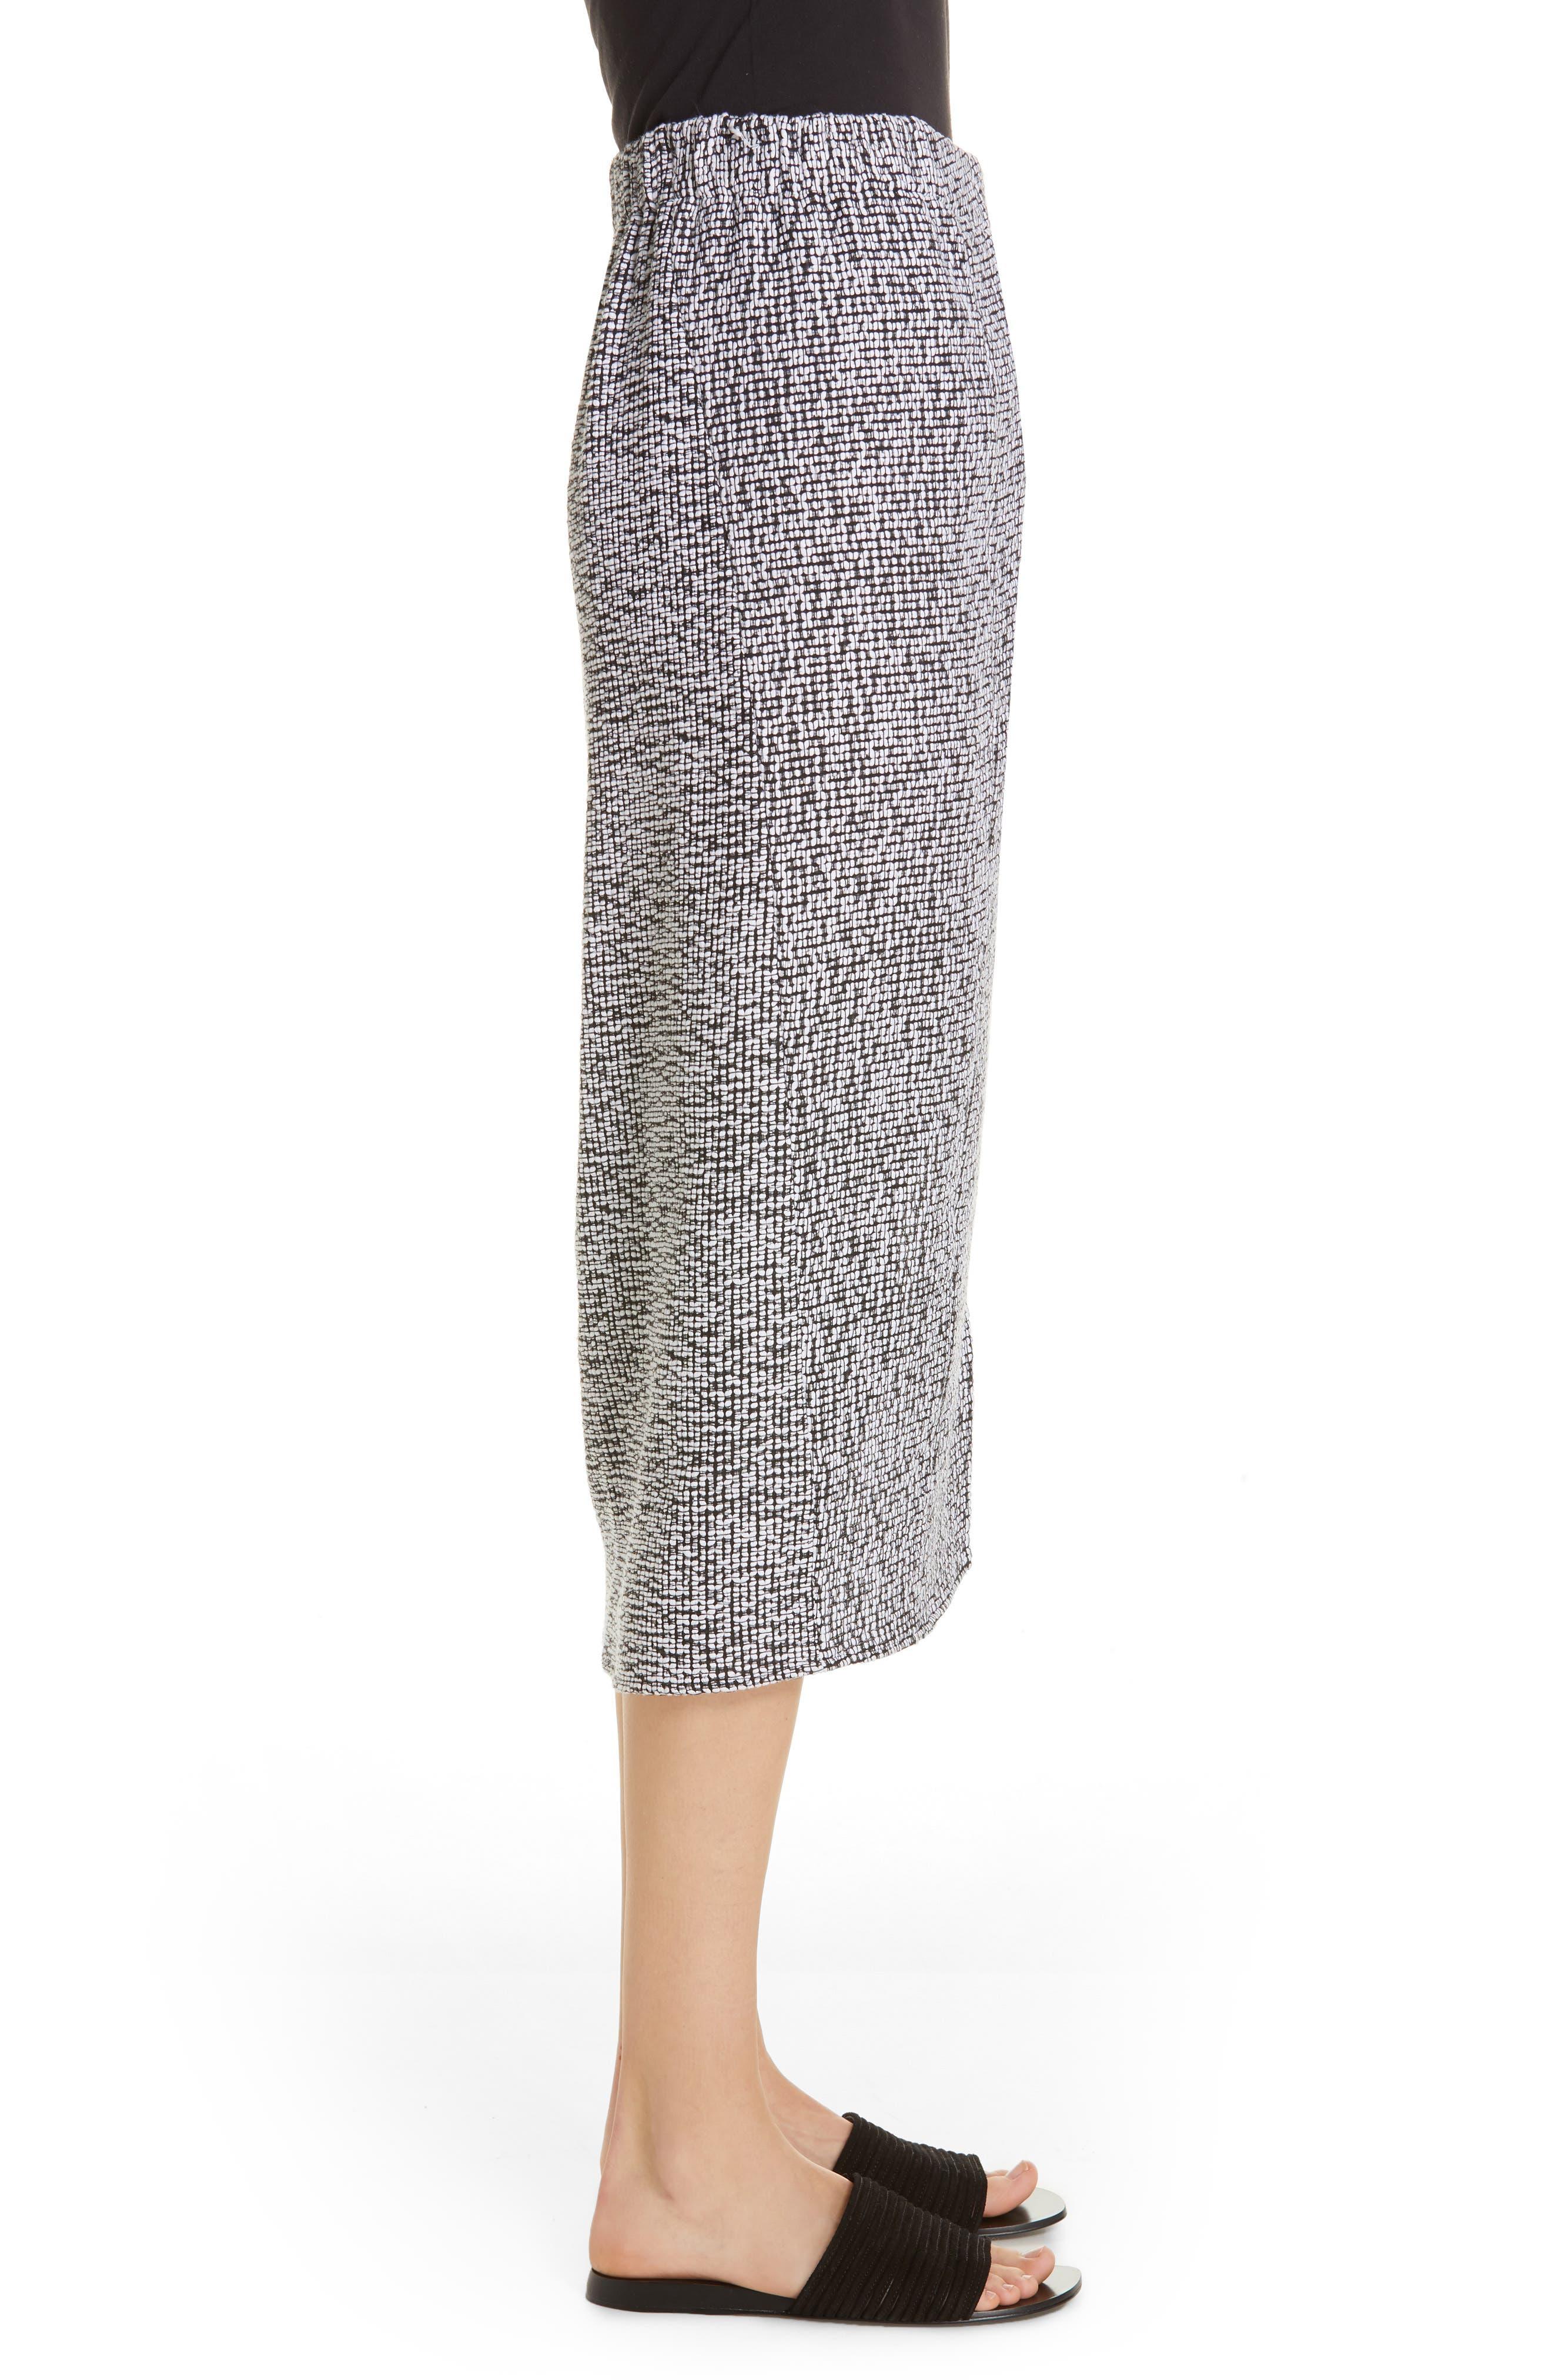 Mio Skirt,                             Alternate thumbnail 3, color,                             WHITE/ BLACK